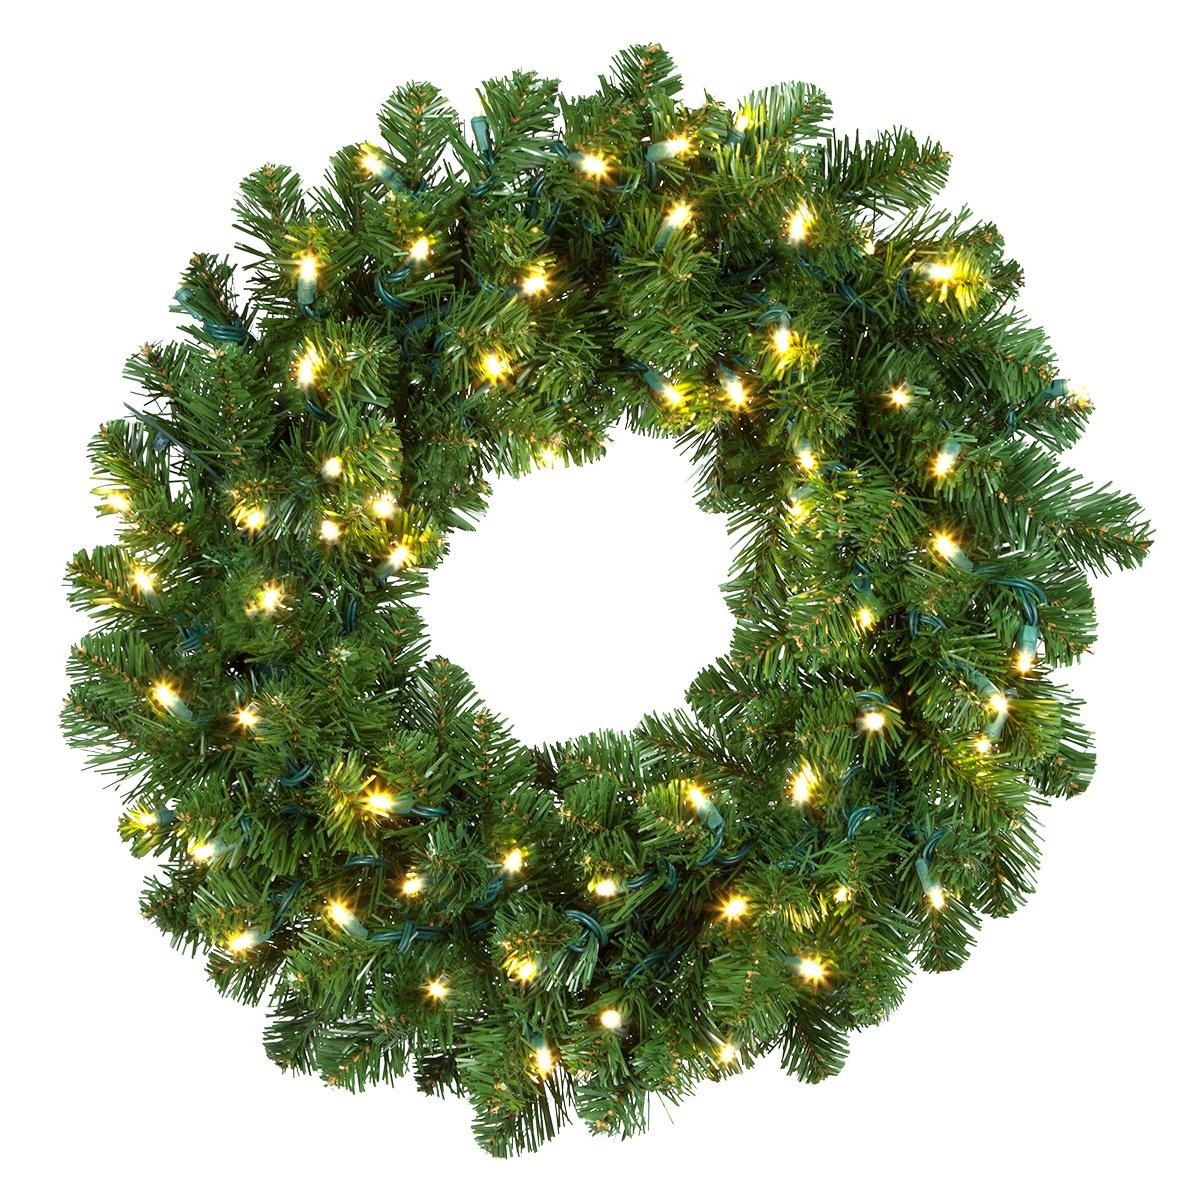 Halloween Window Decorations: Artificial Christmas Wreaths